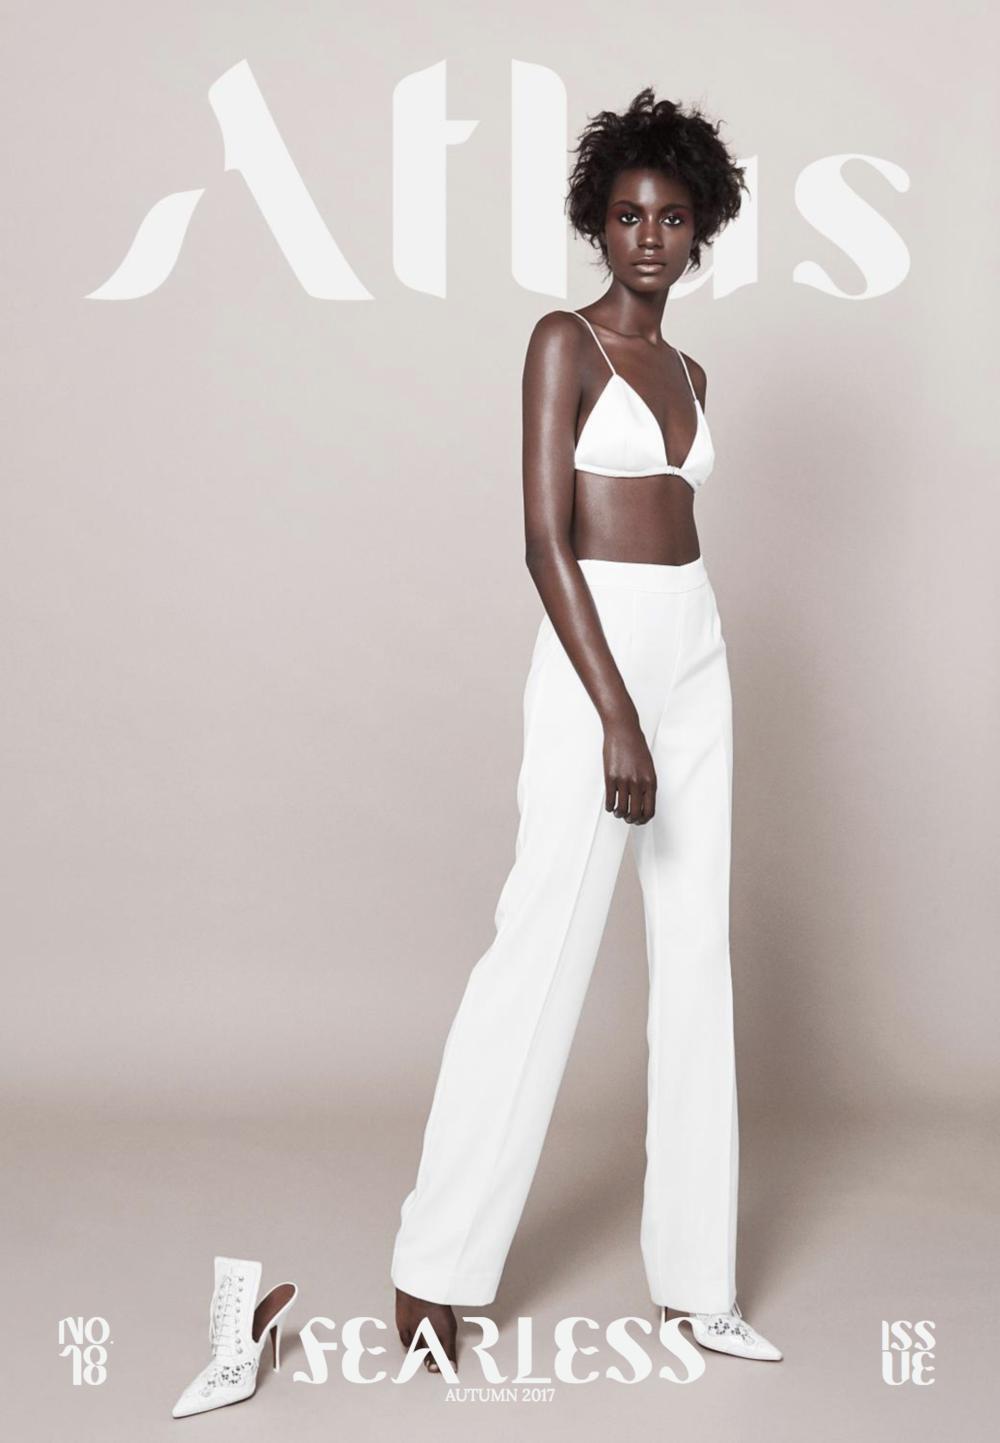 Image from  Atlas Magazine